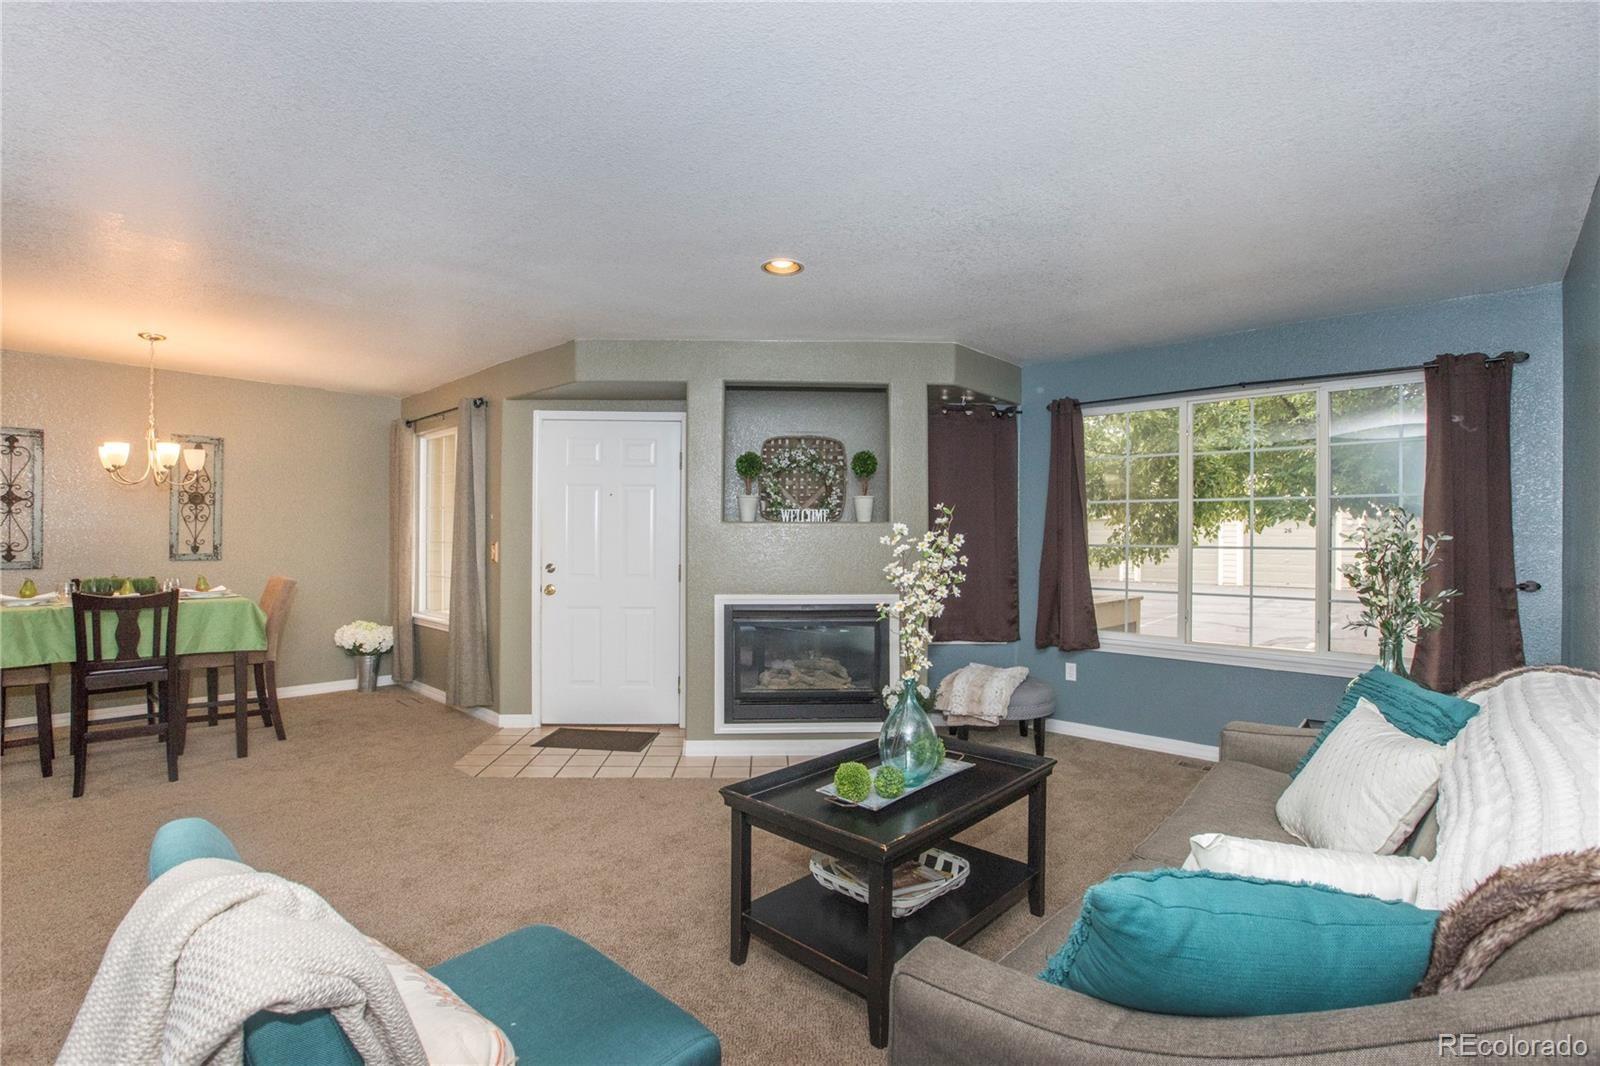 MLS# 3758449 - 8 - 6802 Antigua Drive #26, Fort Collins, CO 80525